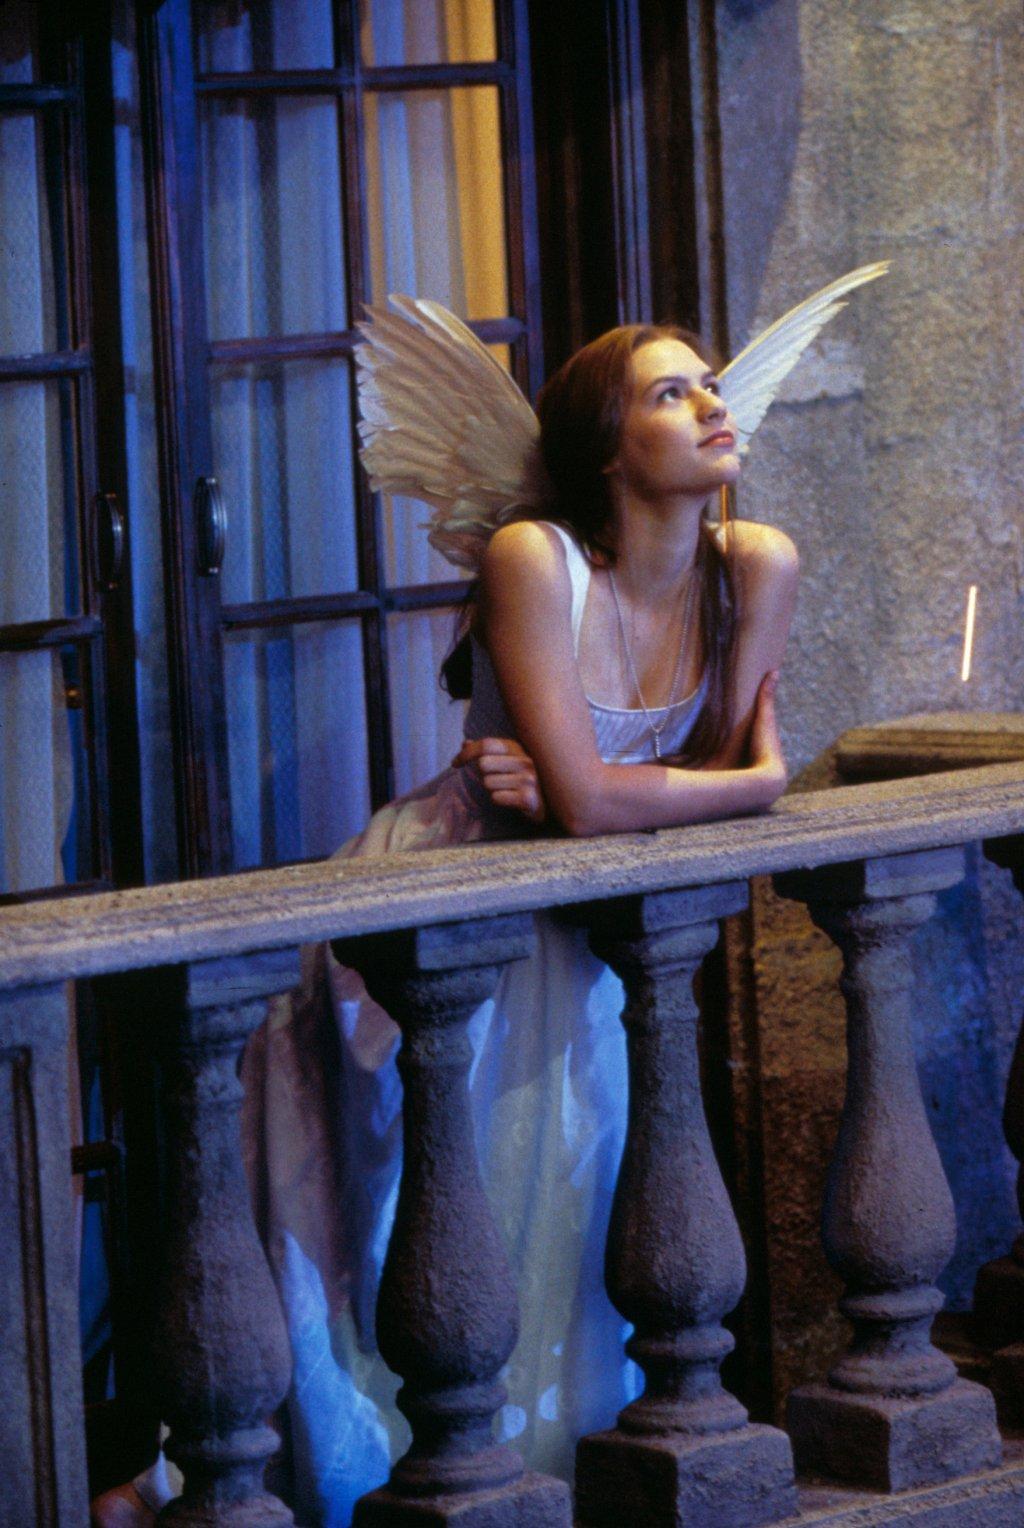 http://4.bp.blogspot.com/-PM59EAcPr3A/UIr-QRNW2PI/AAAAAAAABxo/TA3B6POzHro/s1600/Claire-Danes-angel-Romeo-y-Julieta-pelicula-film-Juliet.jpg